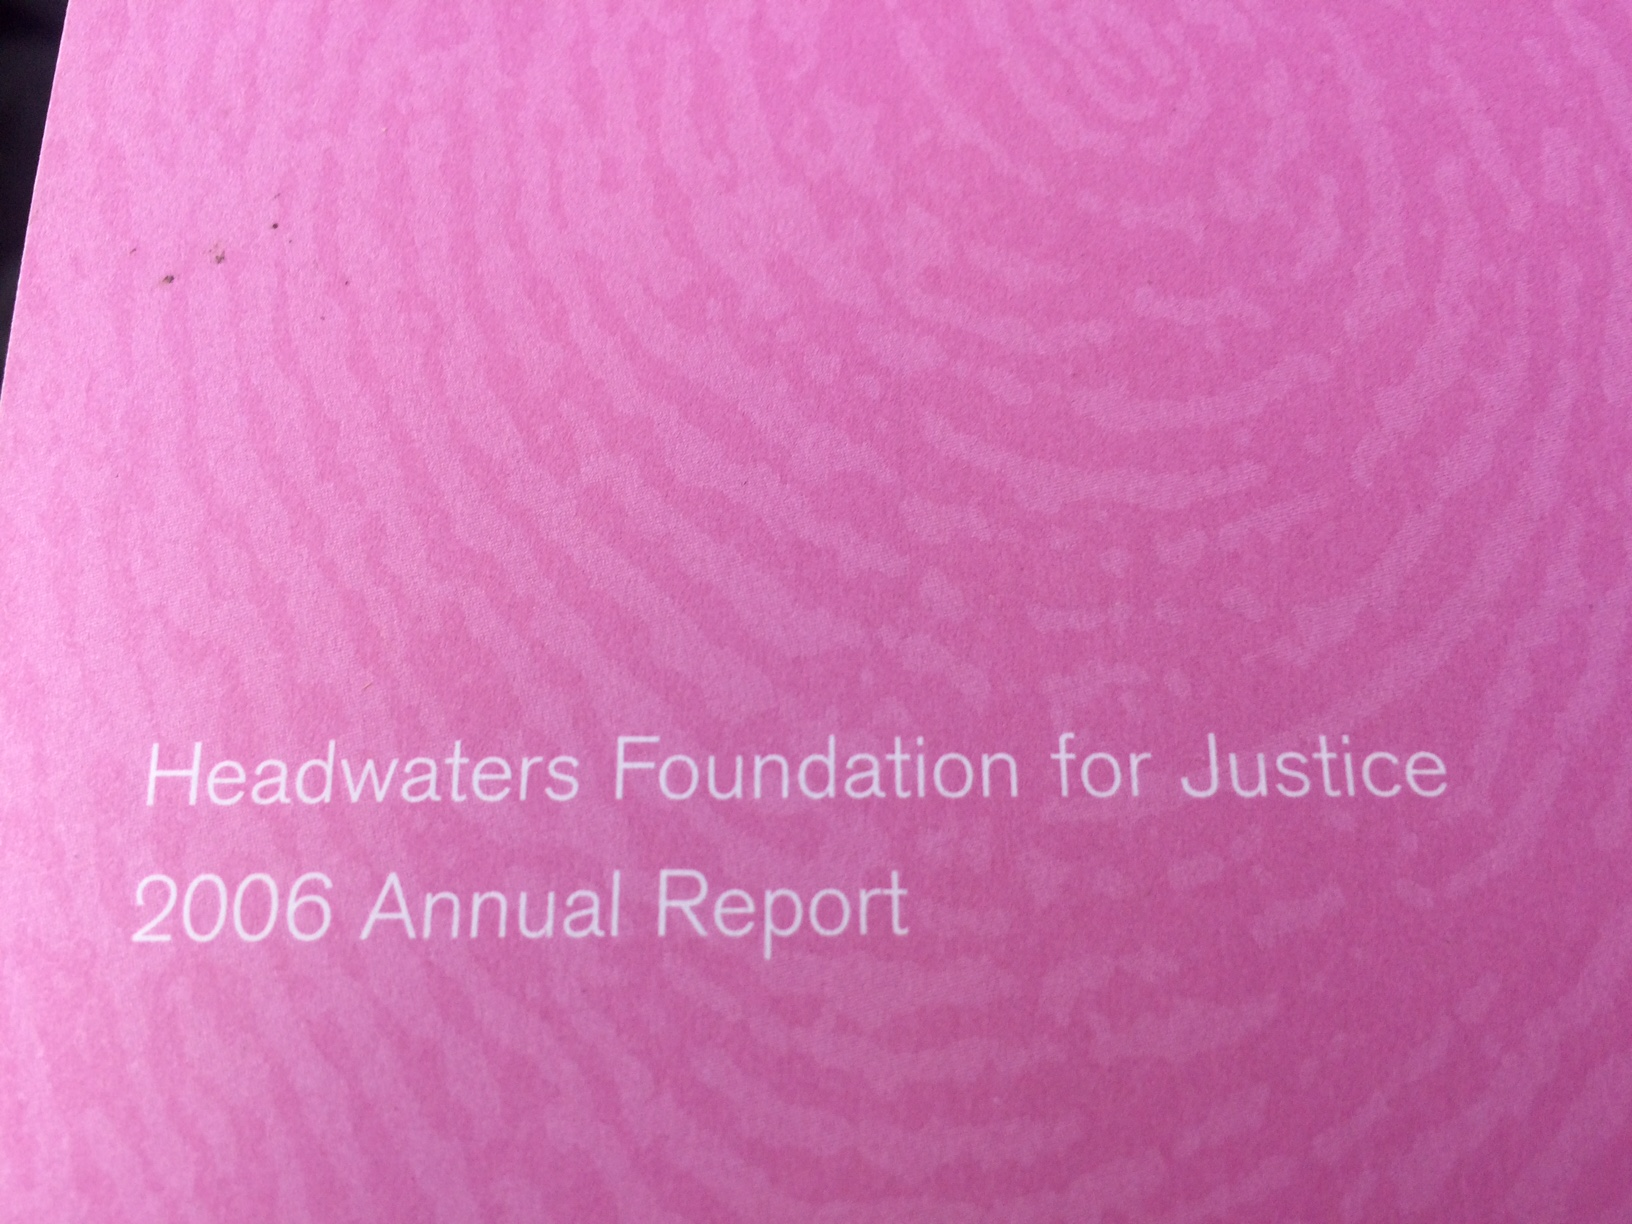 Annual Report Writer